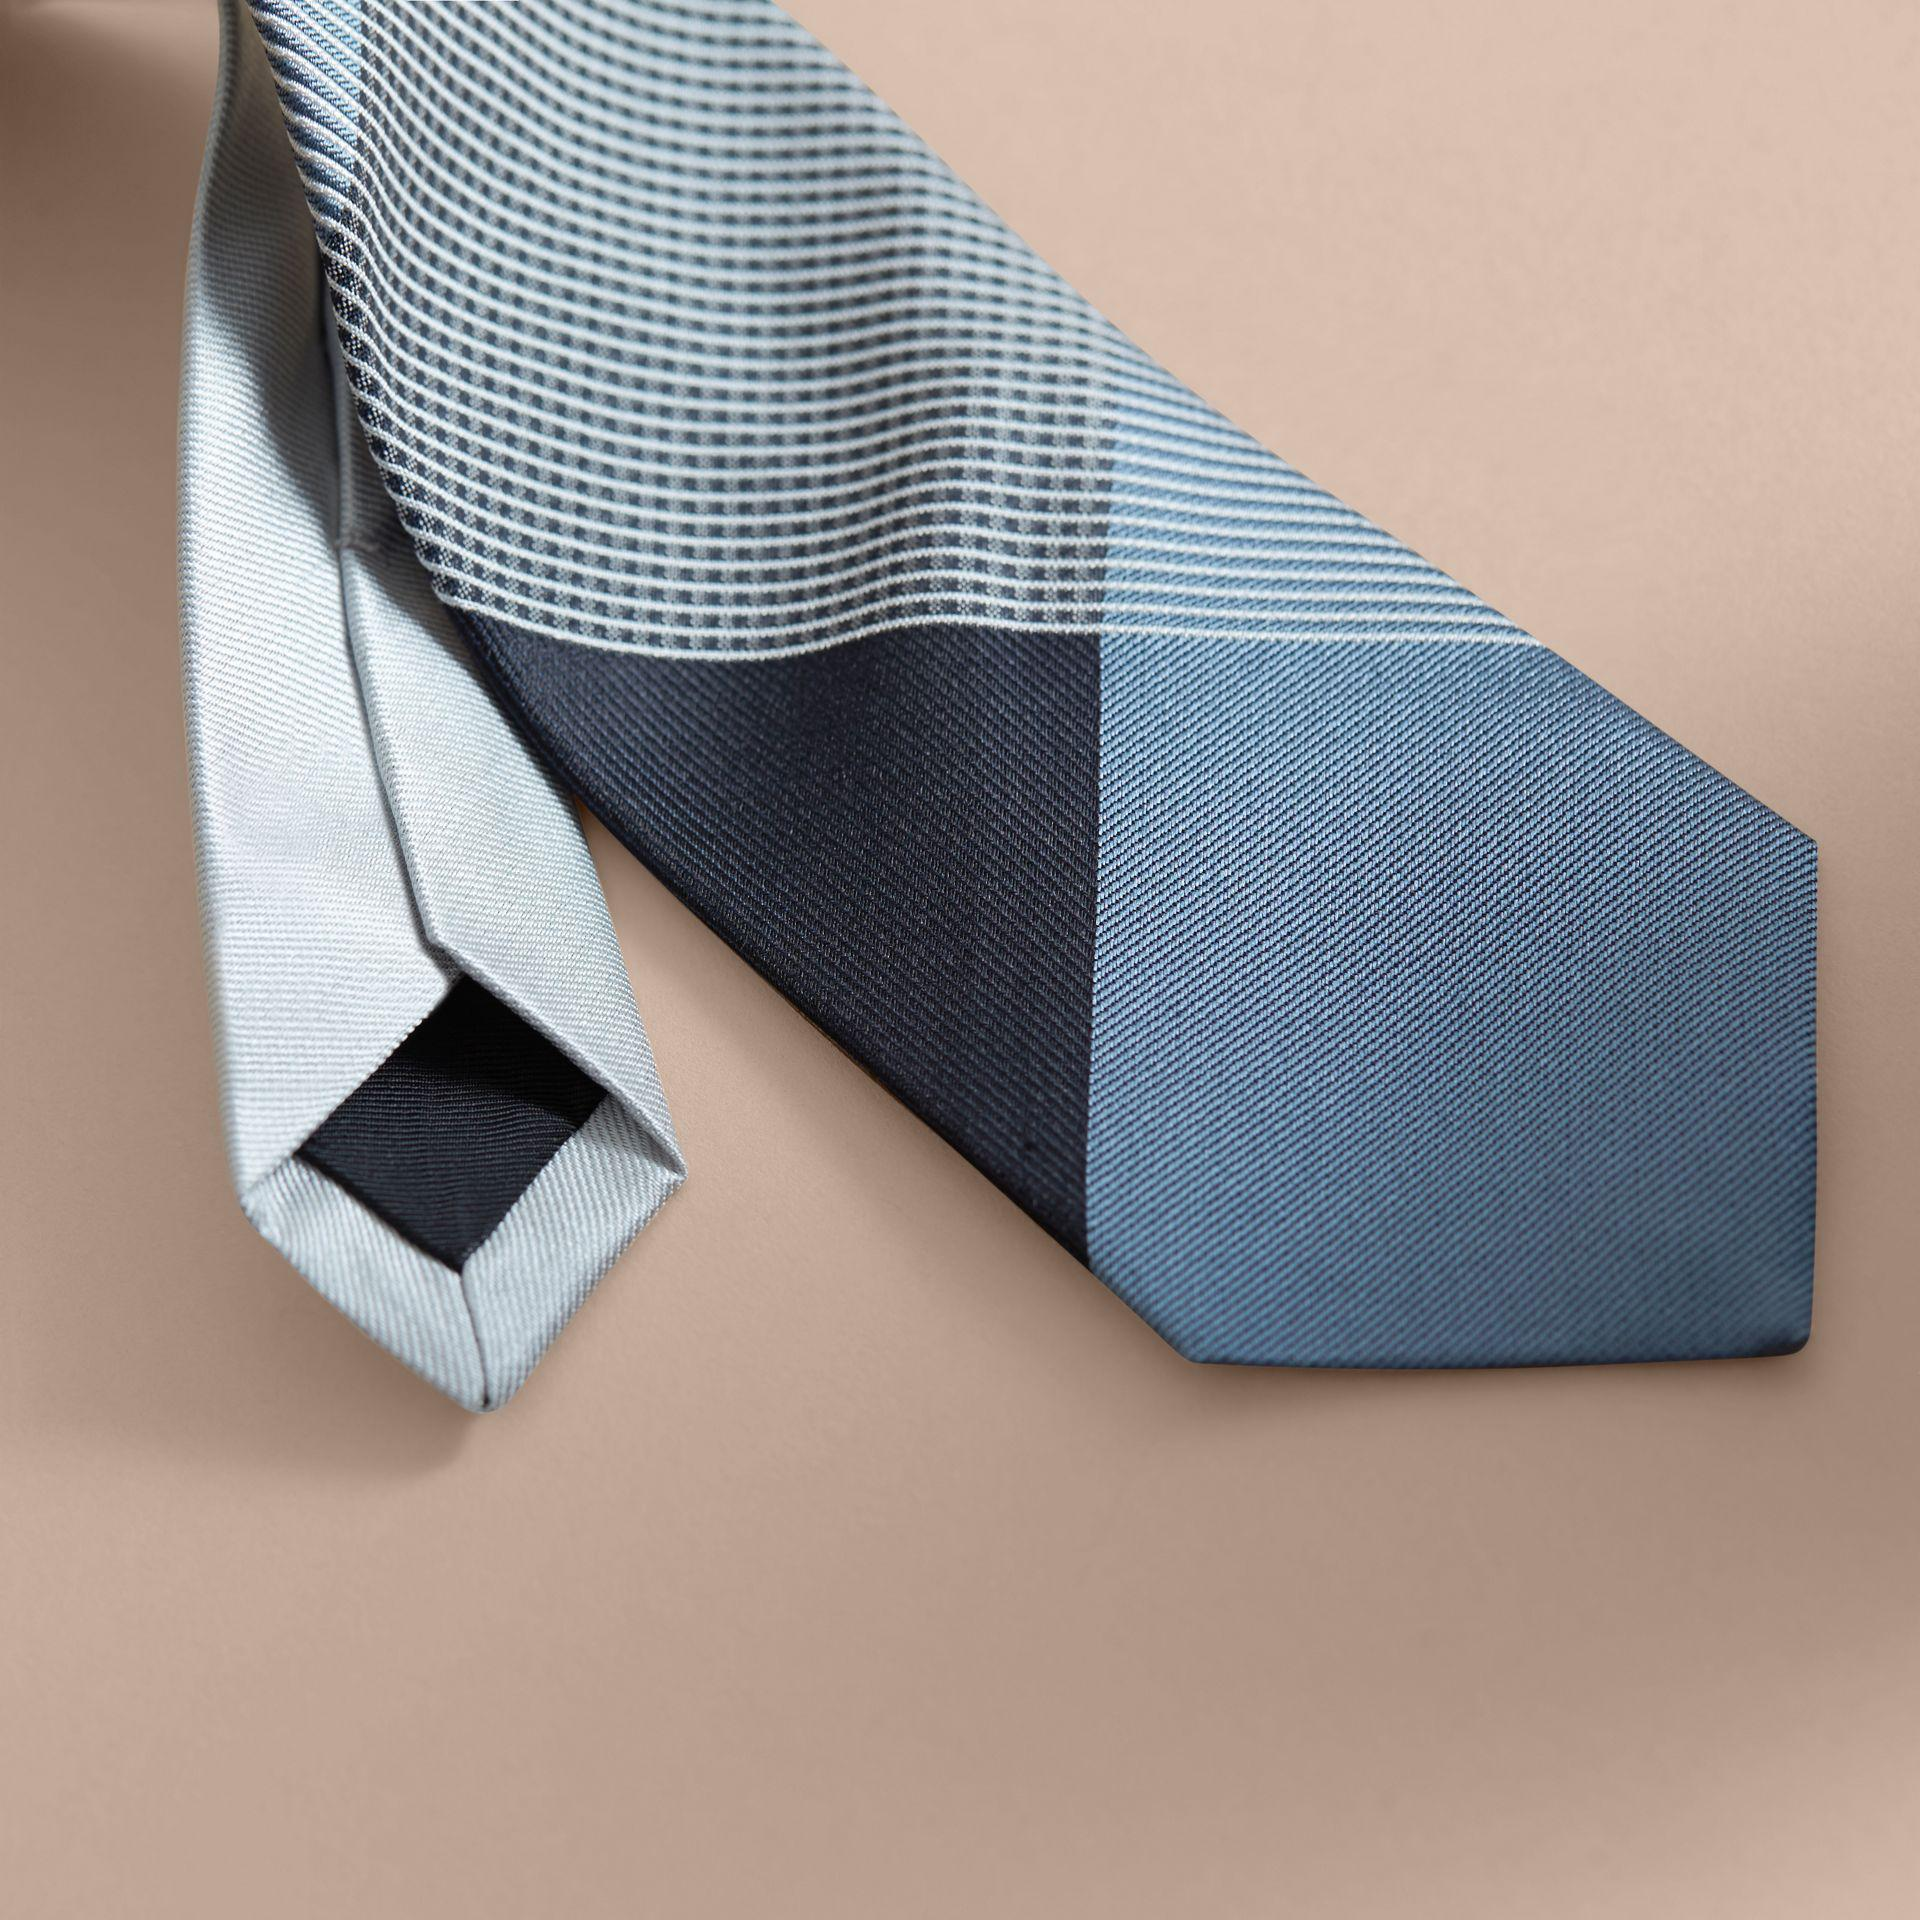 0a880905ce94 Lyst - Burberry Modern Cut Gingham Check Silk Jacquard Tie Slate ...